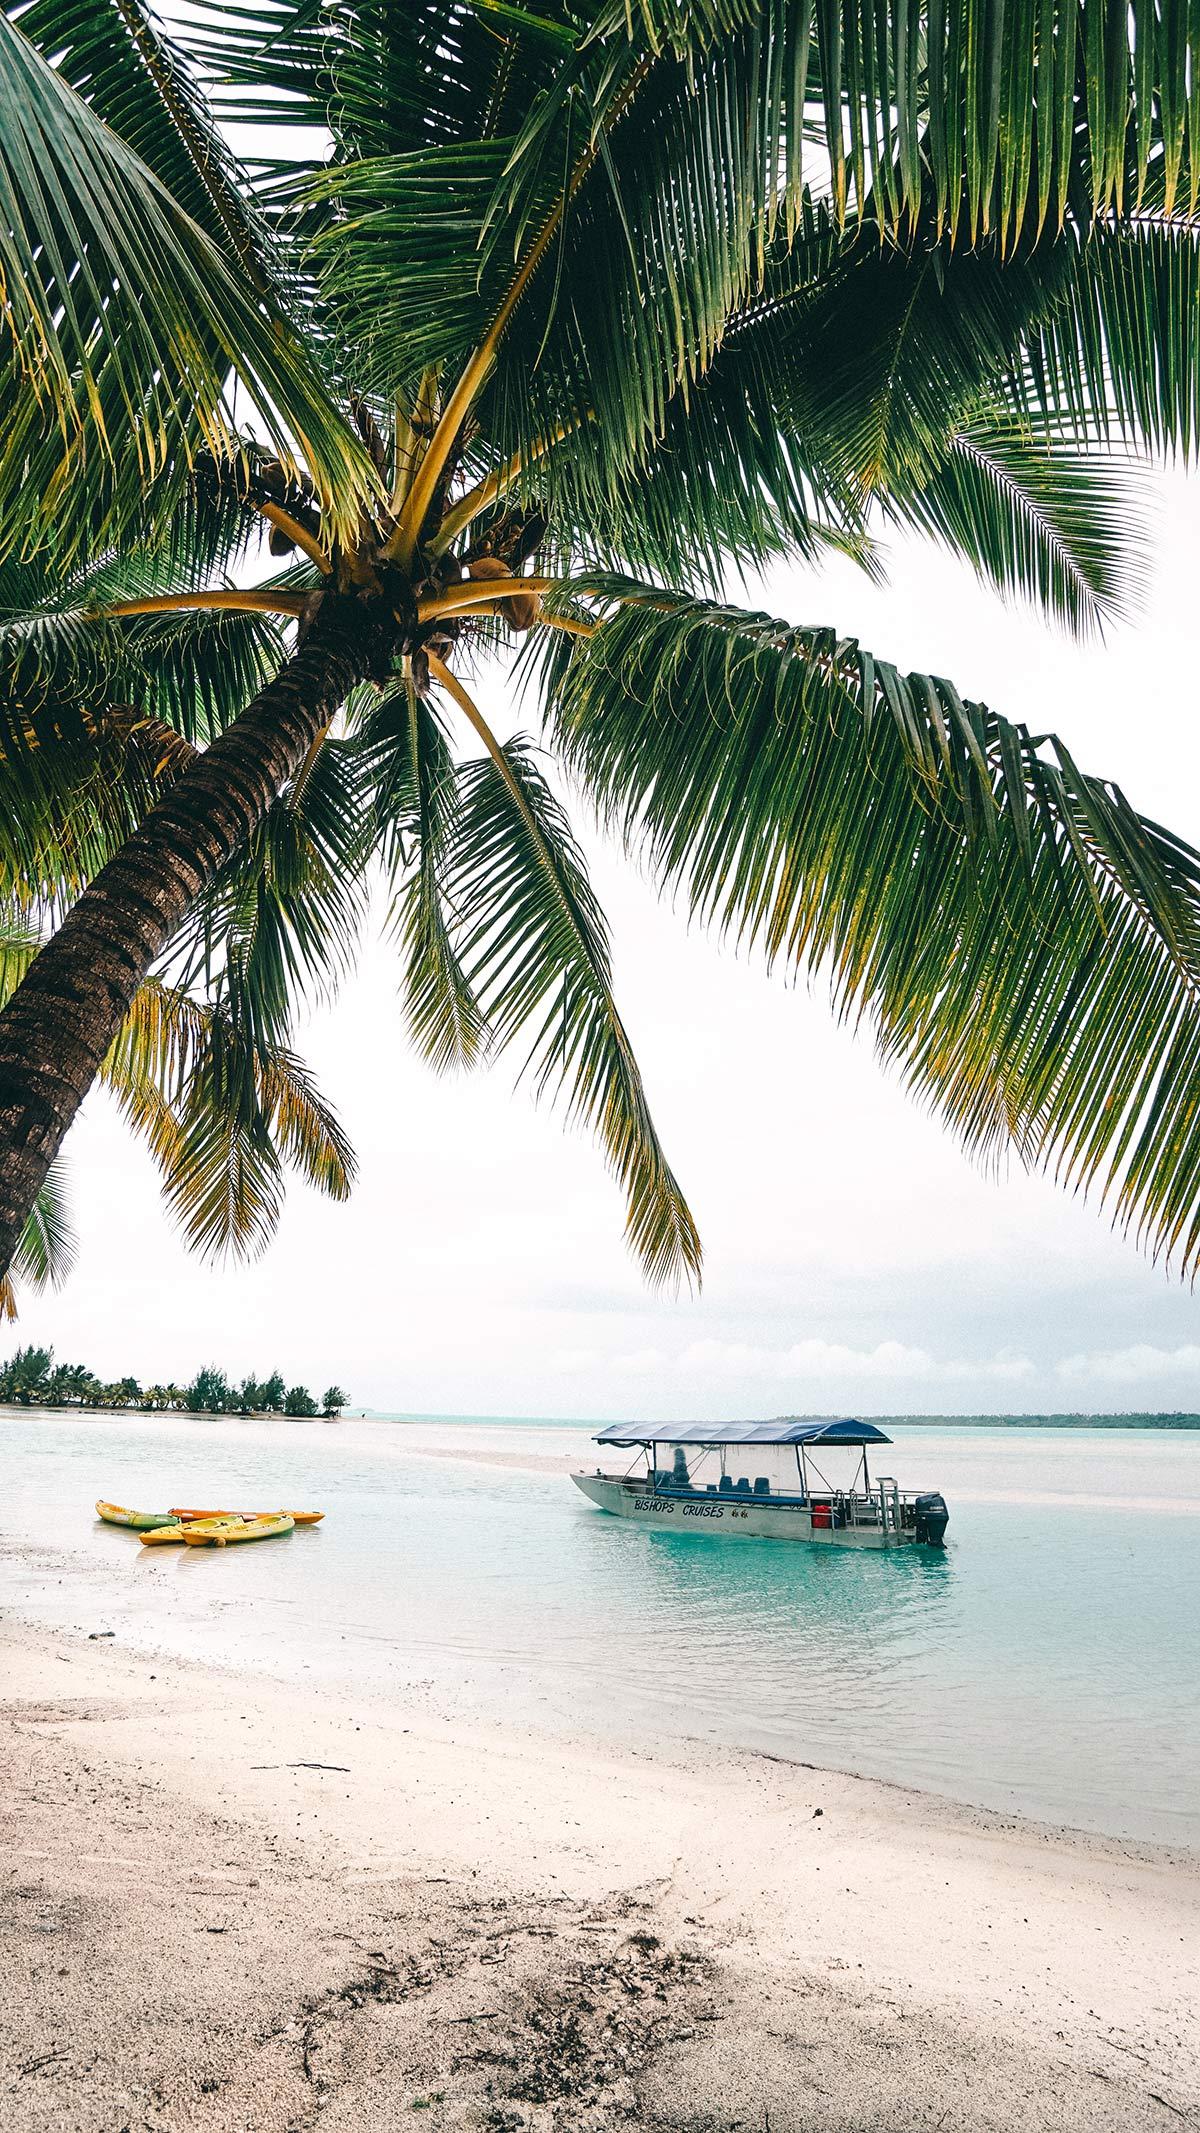 Bishops Cruise durch LagunevAitutakis